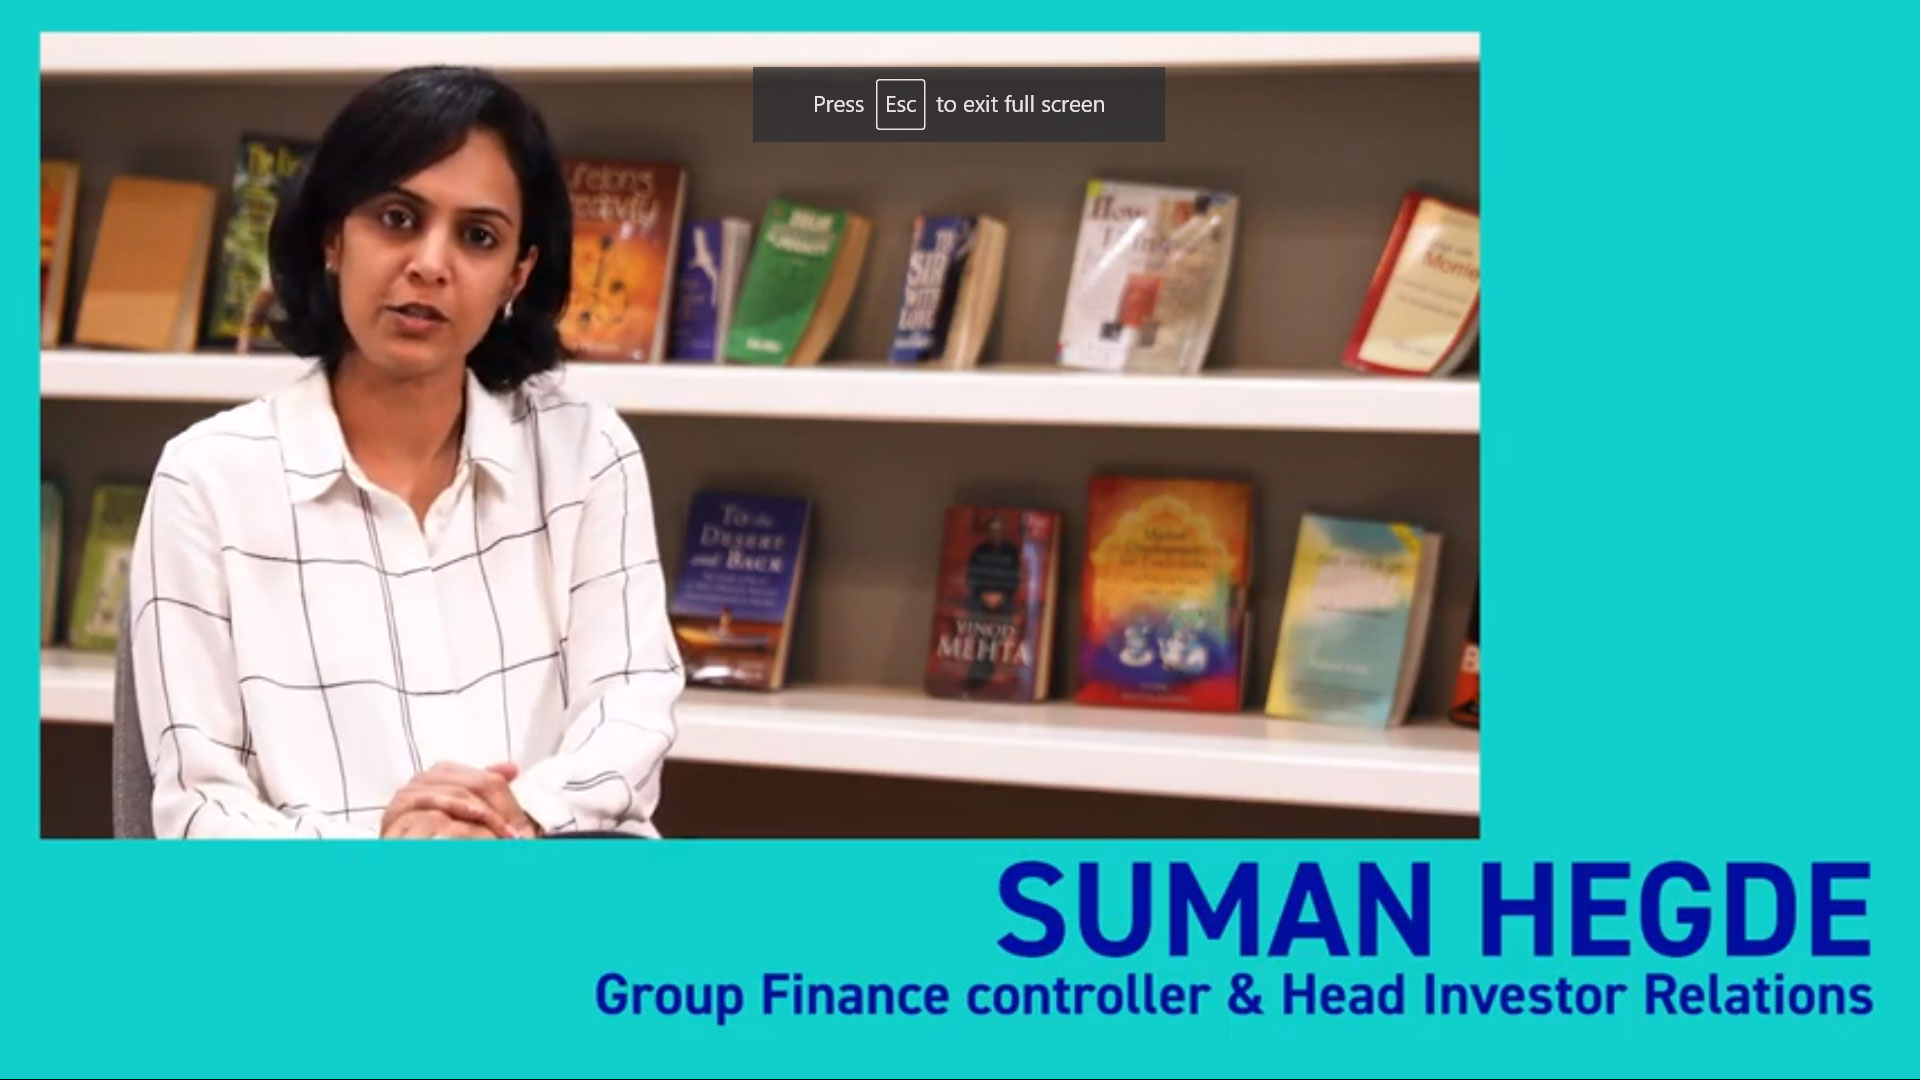 Suman Hegde Group Finance Controller & Head Investor Relations